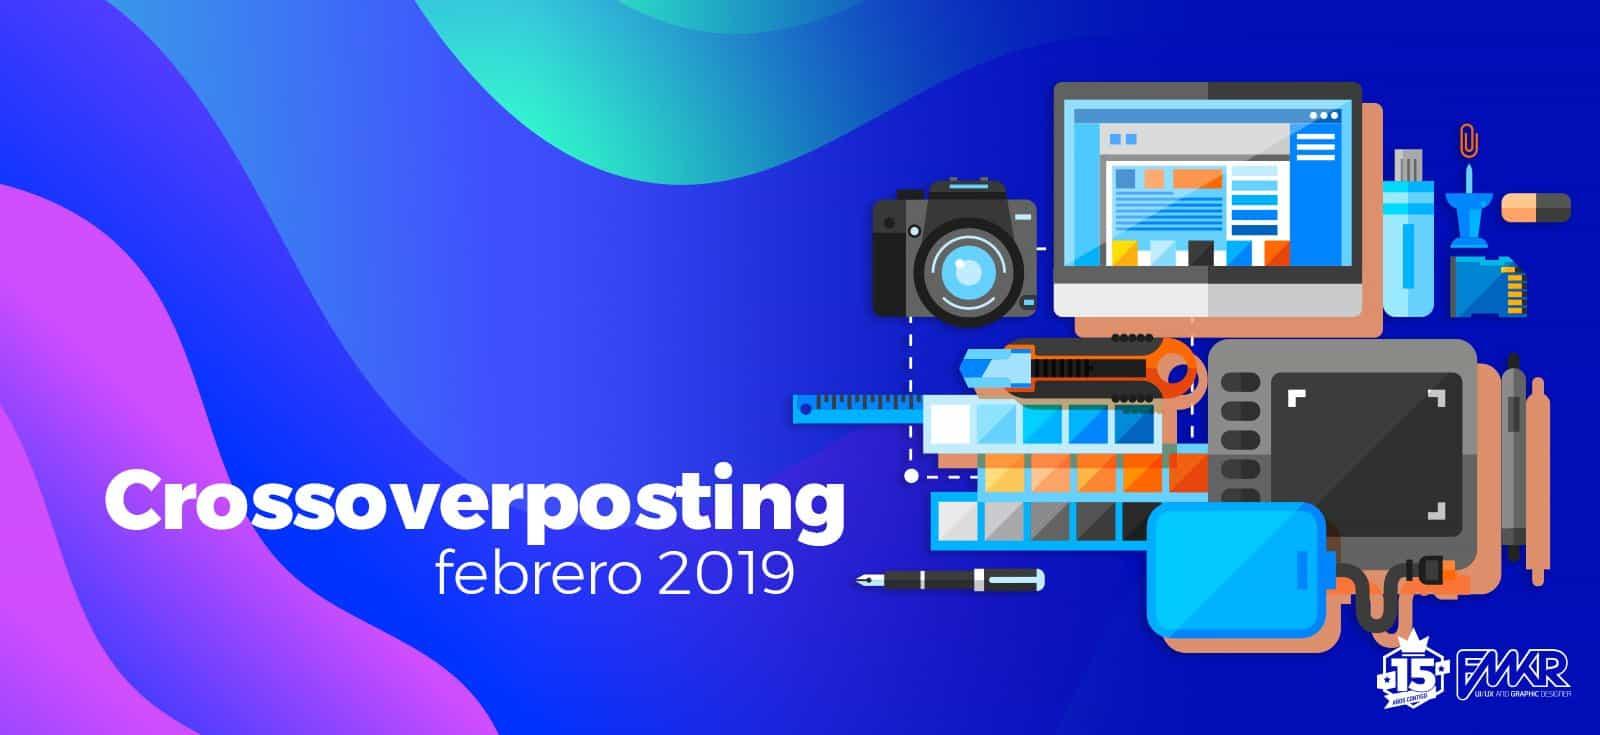 Crossoverposting febrero 2019